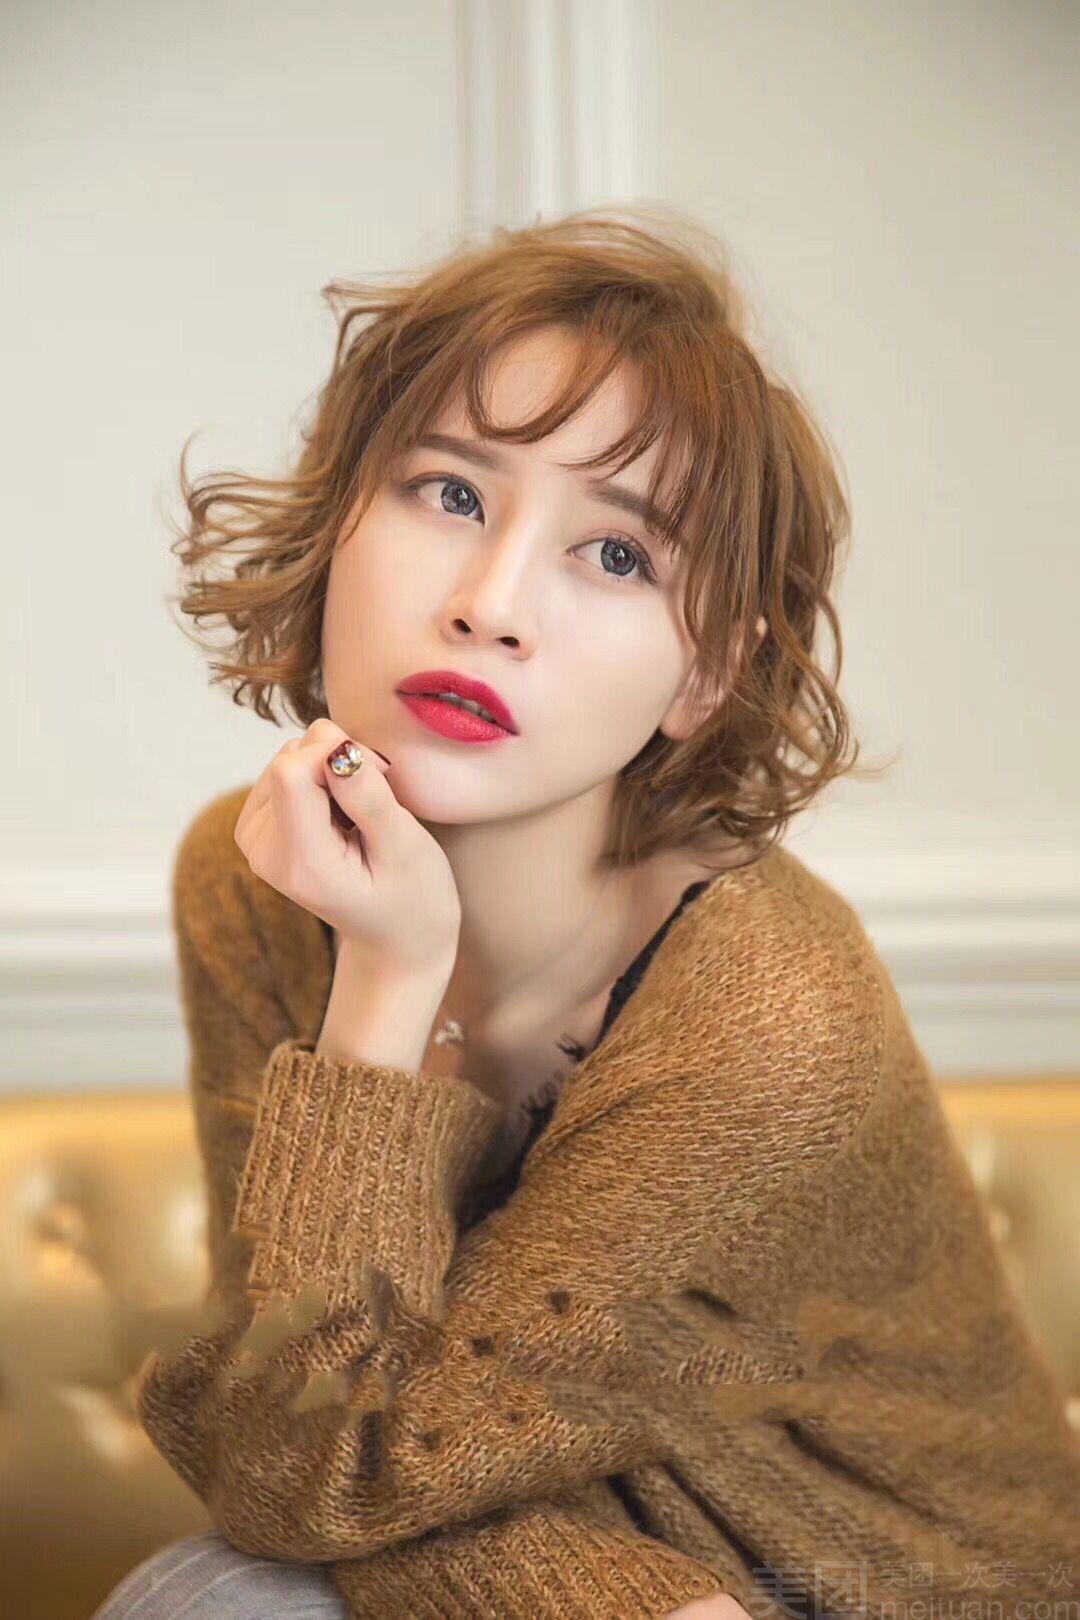 【b.boss美发造型】温德芭烫发/染发套餐图片